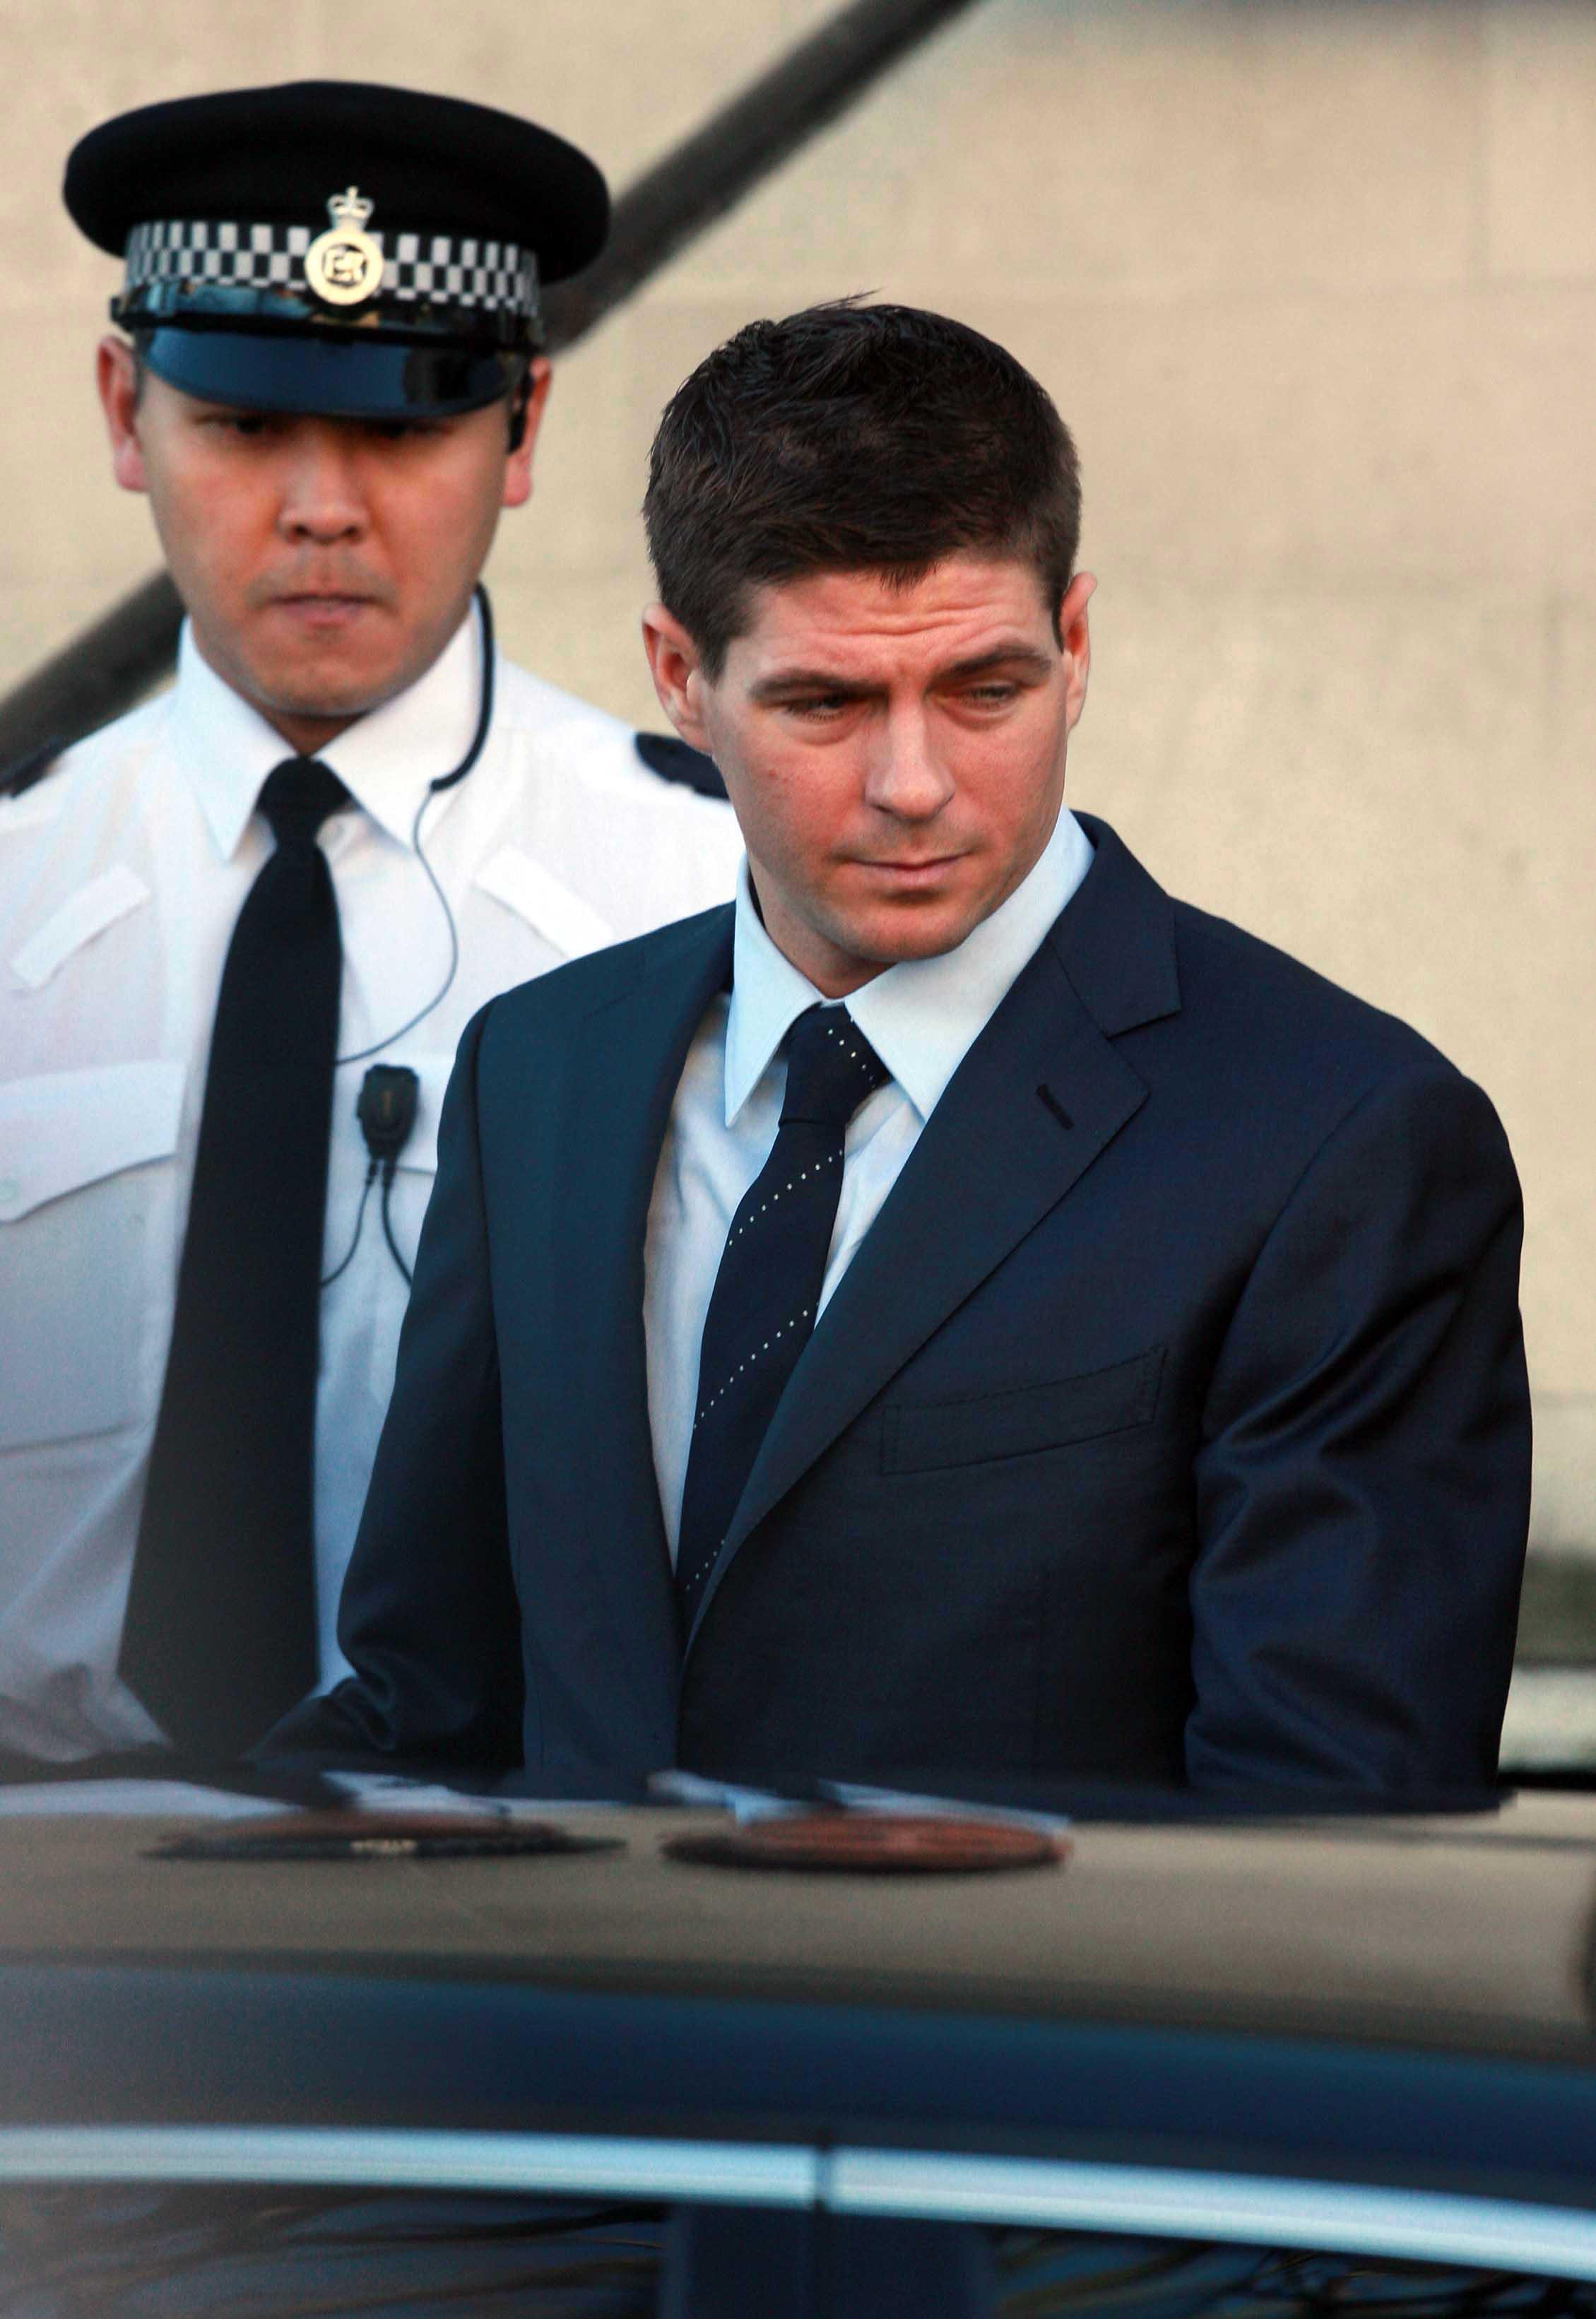 nti_Gerrard_Court_09.JPG